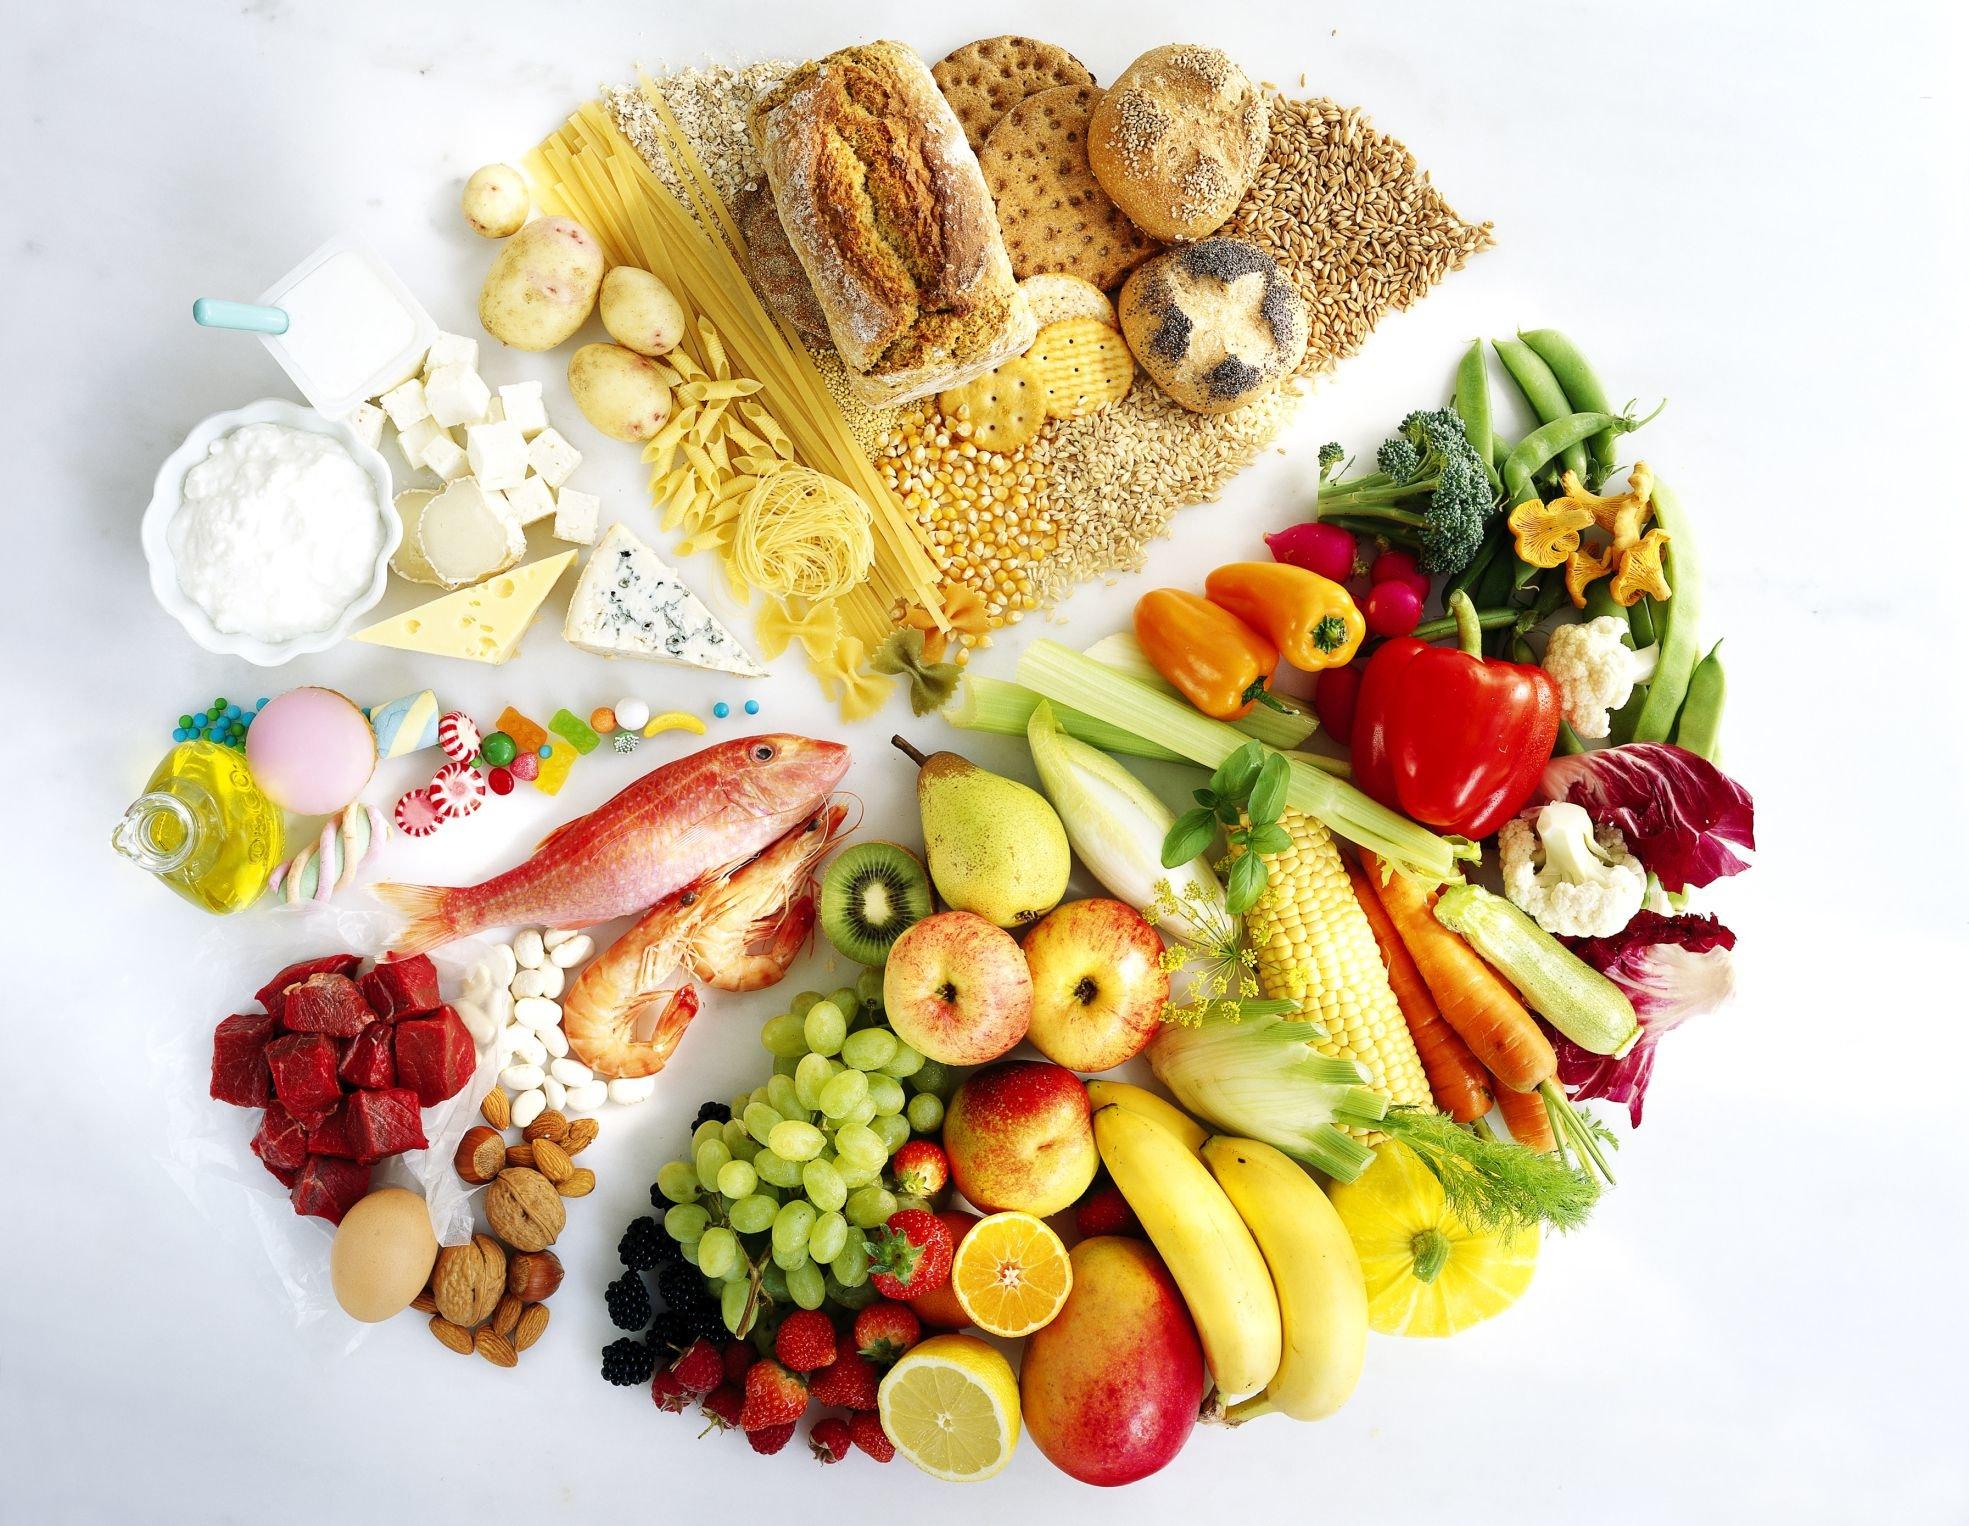 системное питание картинки александра